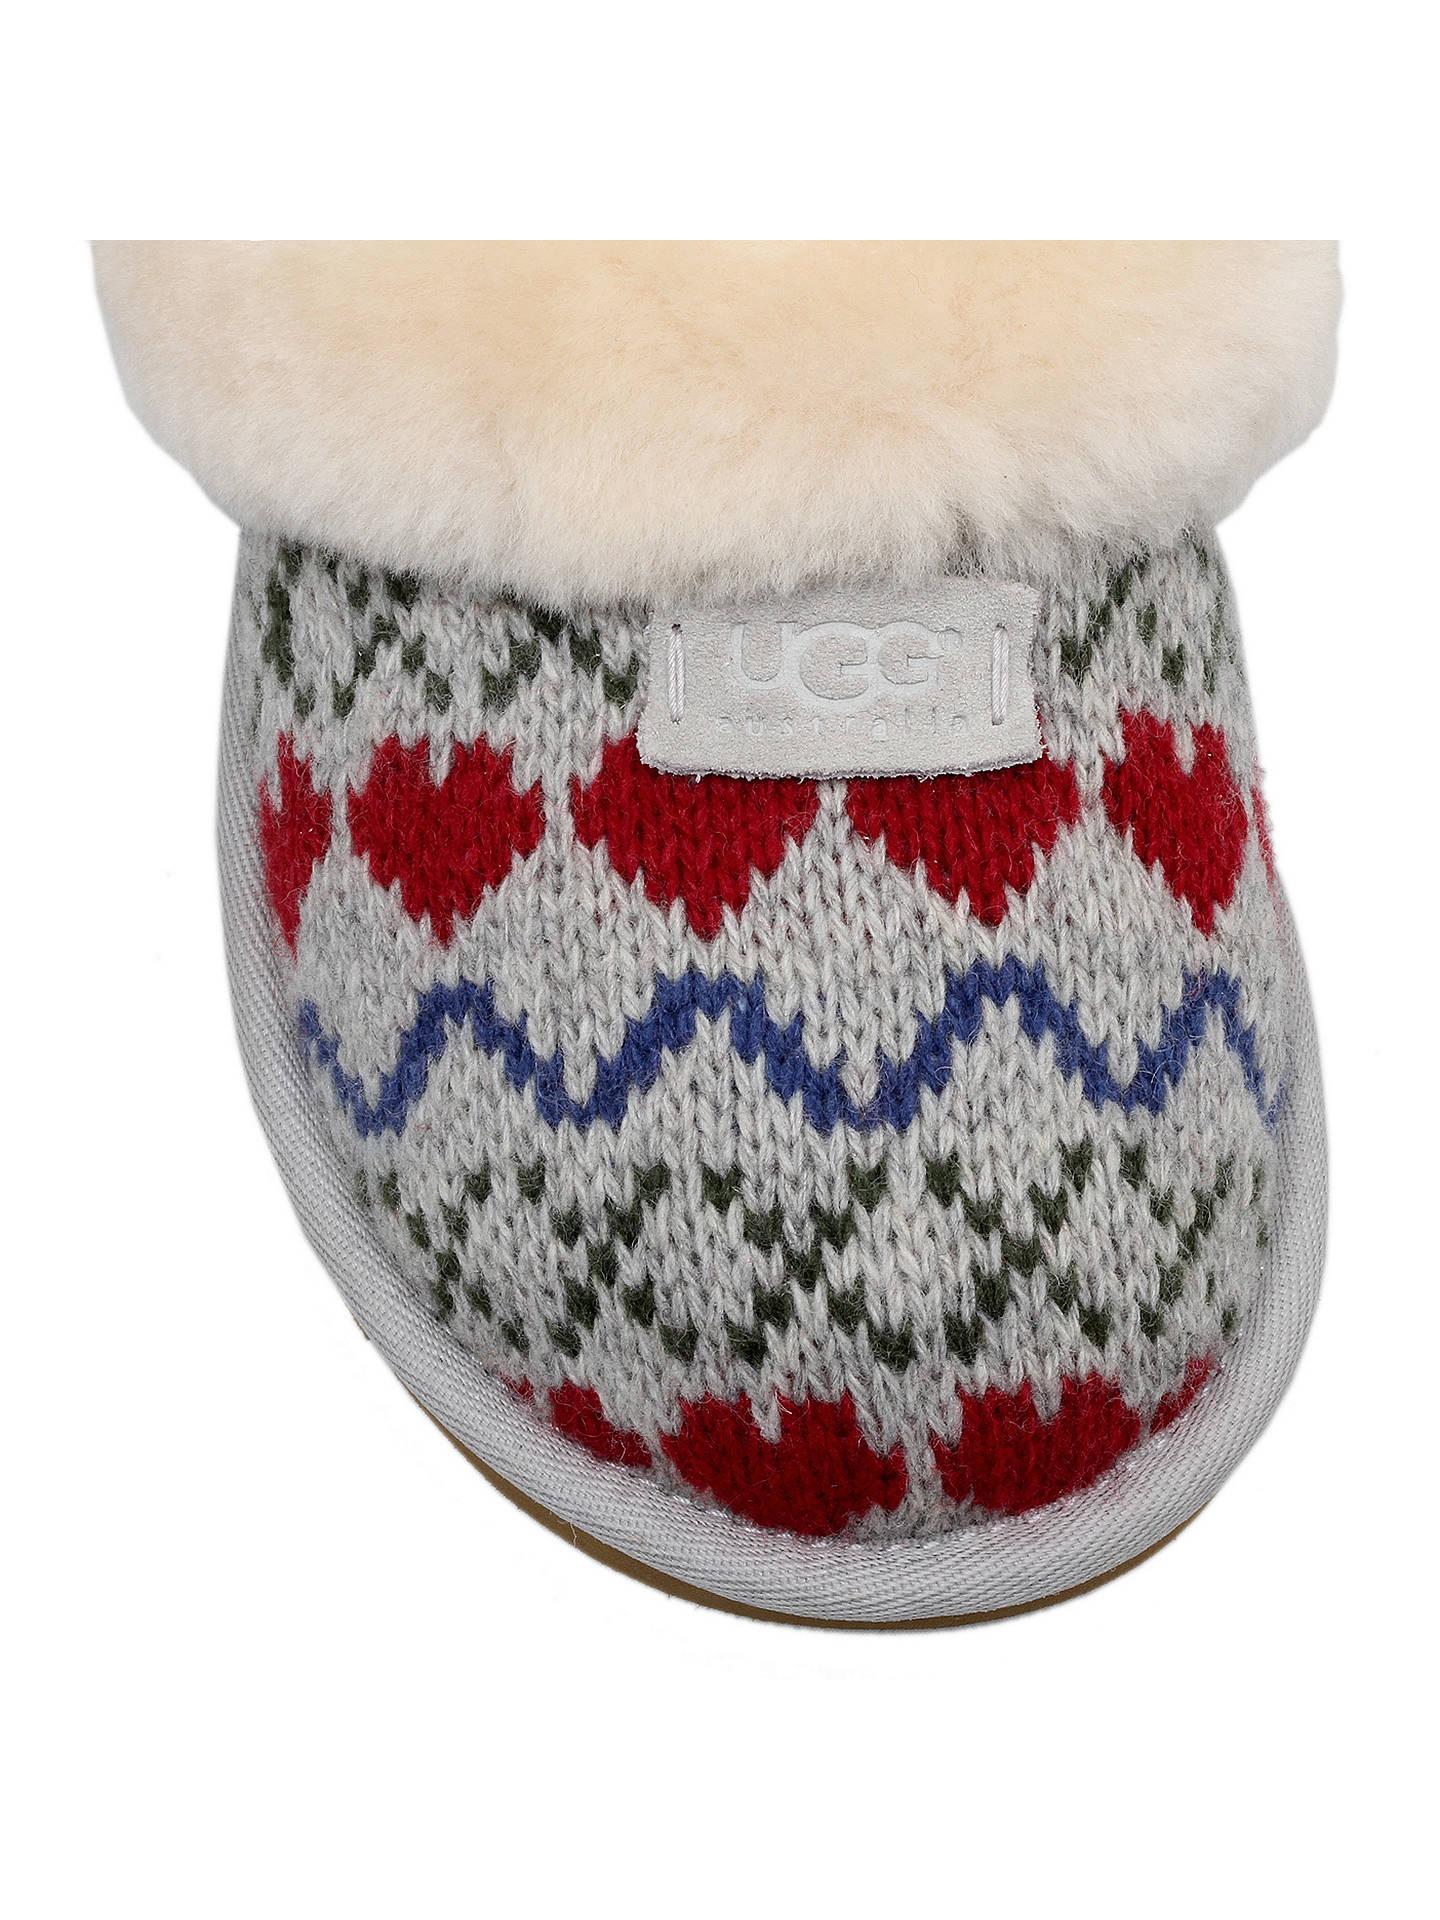 Ugg Cosy Knit Heart Printed Sheepskin Slippers Grey At John Lewis